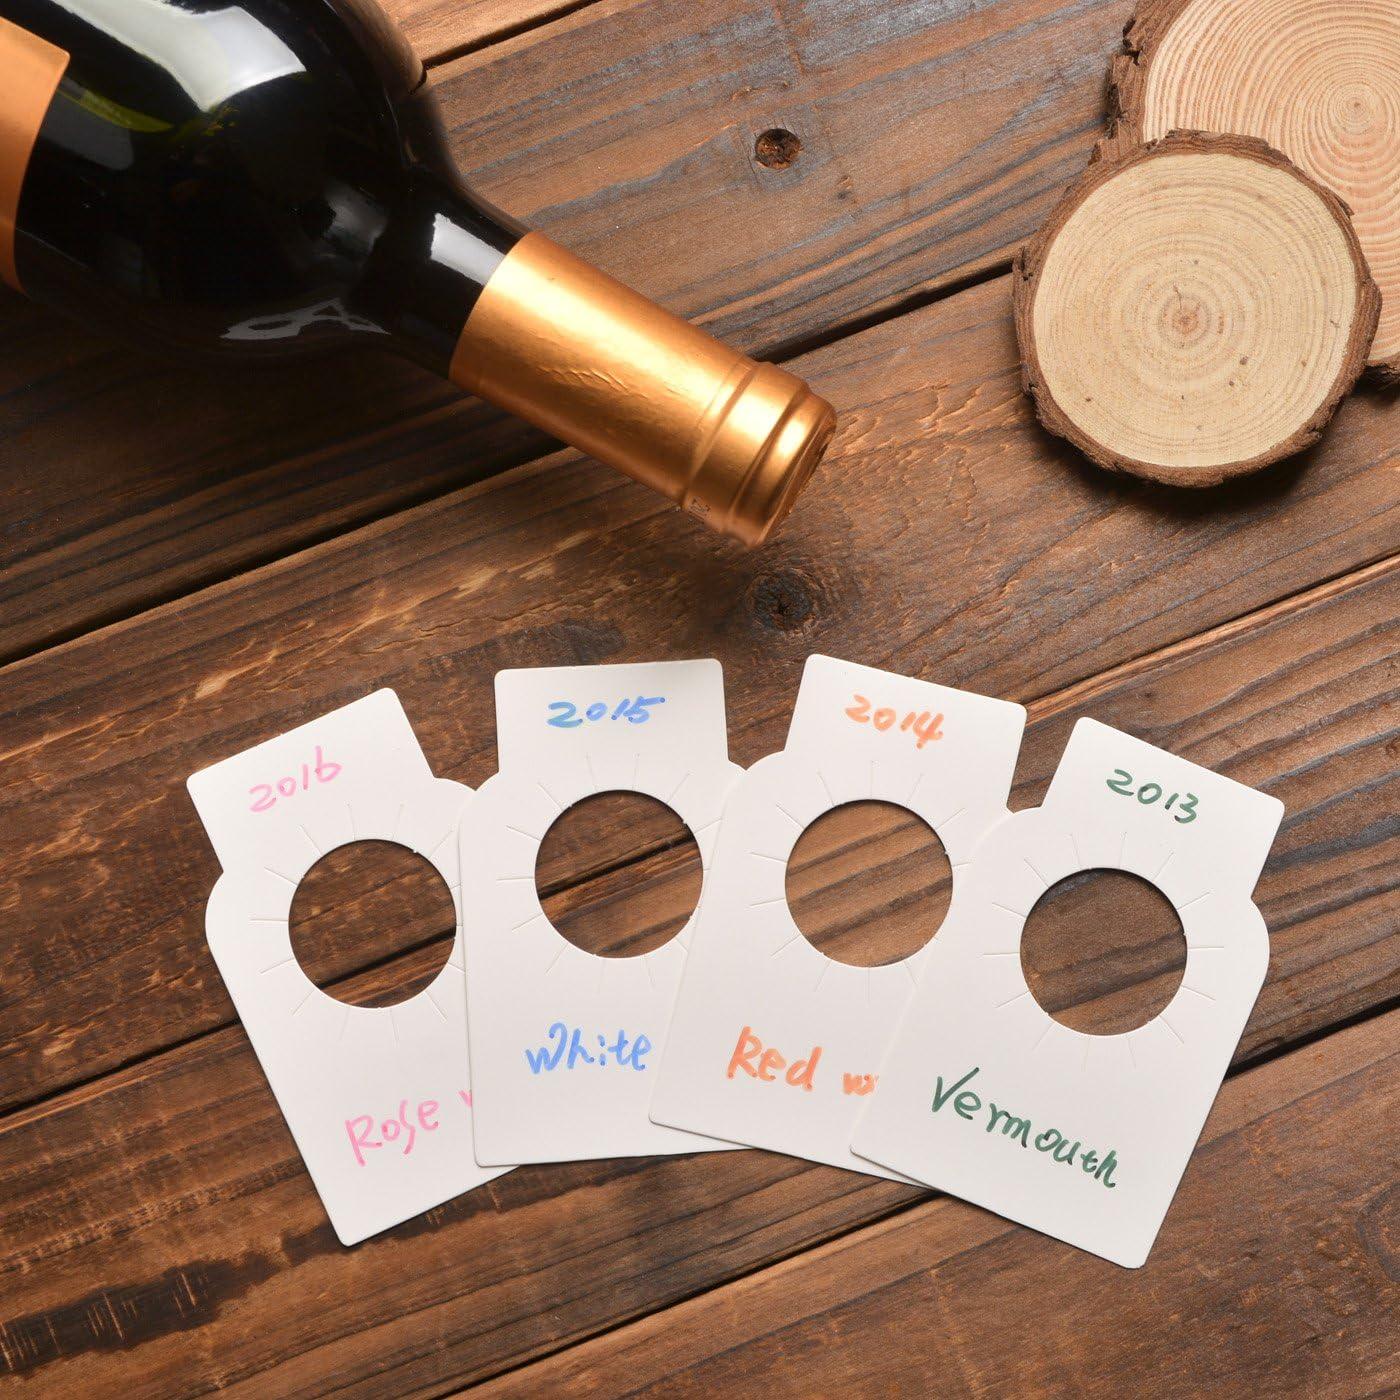 NOVSIX Etiquetas de la Botella de Vino de Papel Blanco - 200 Etiquetas de Vino de la Bodega de Papel Liso